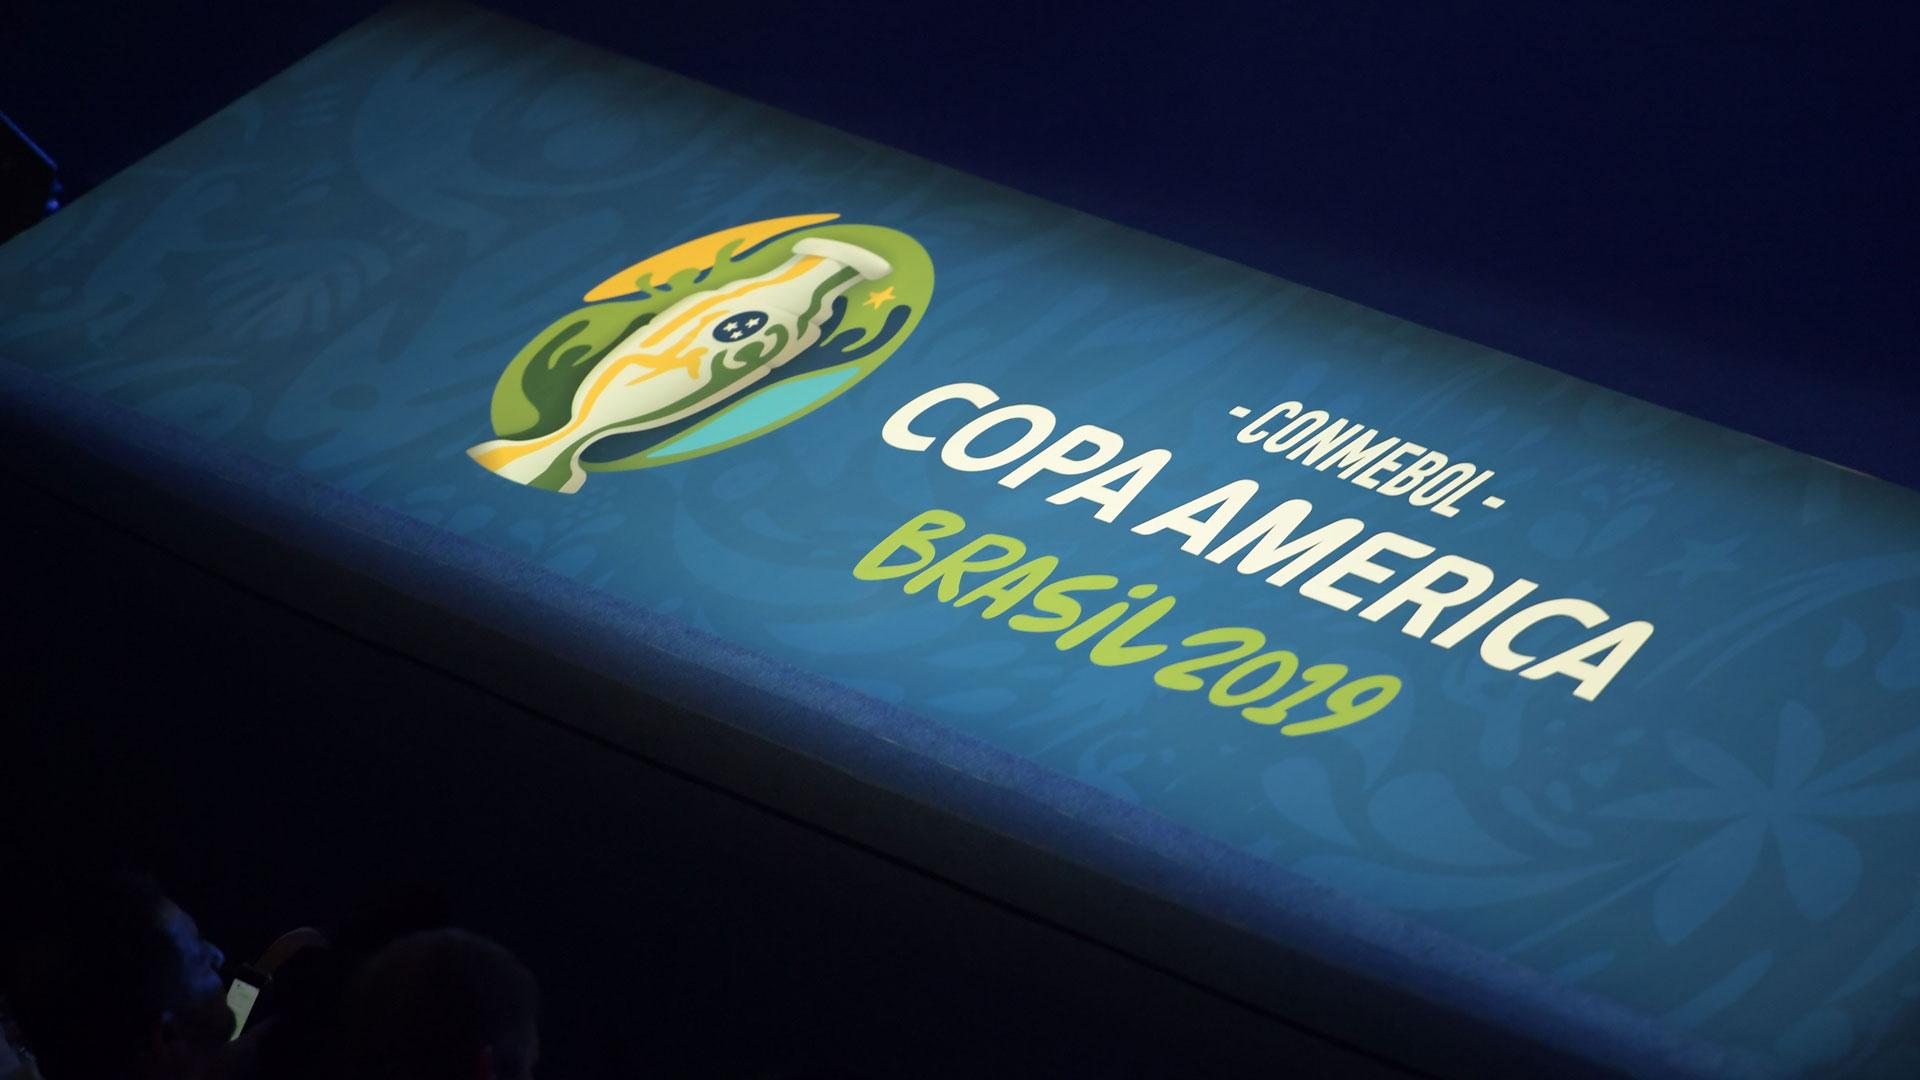 Copa America 2019 Brasilien